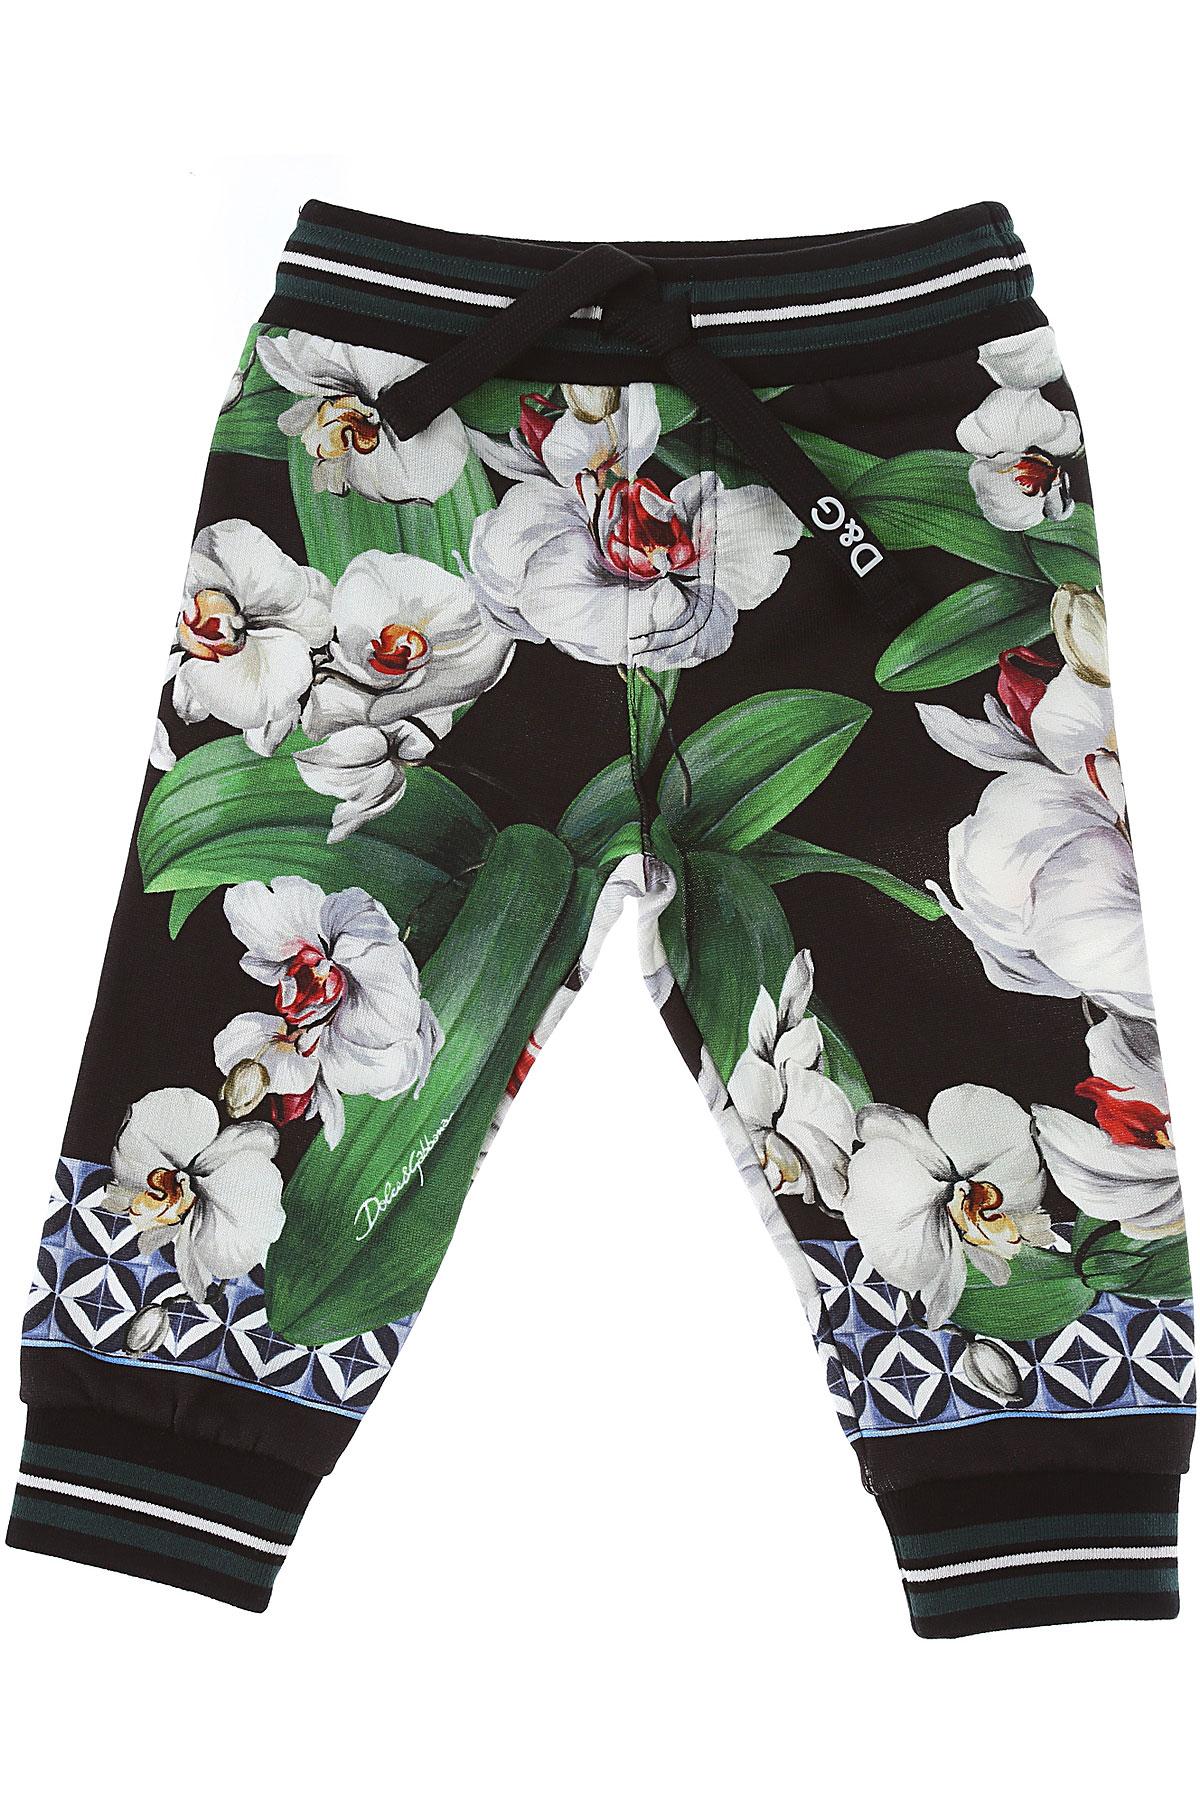 Dolce & Gabbana Baby Pants for Girls On Sale, Black, Cotton, 2019, 12M 18M 24M 30M 9M